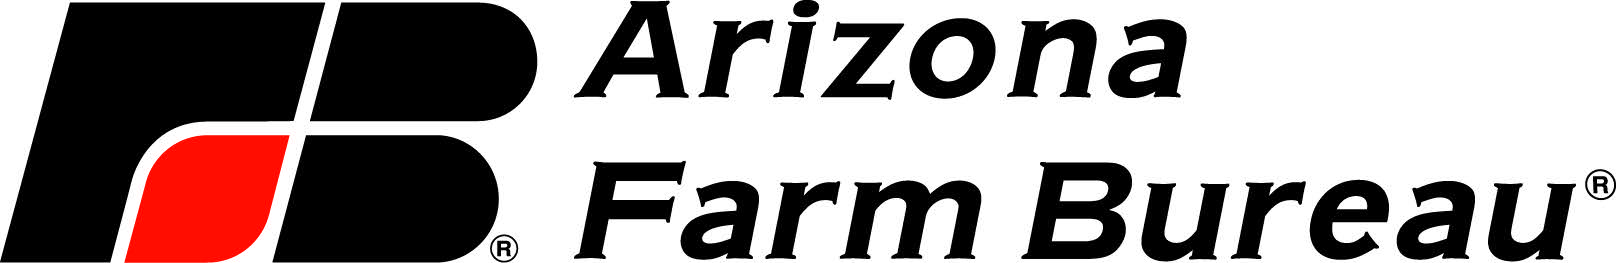 AZFB logo with text.jpg